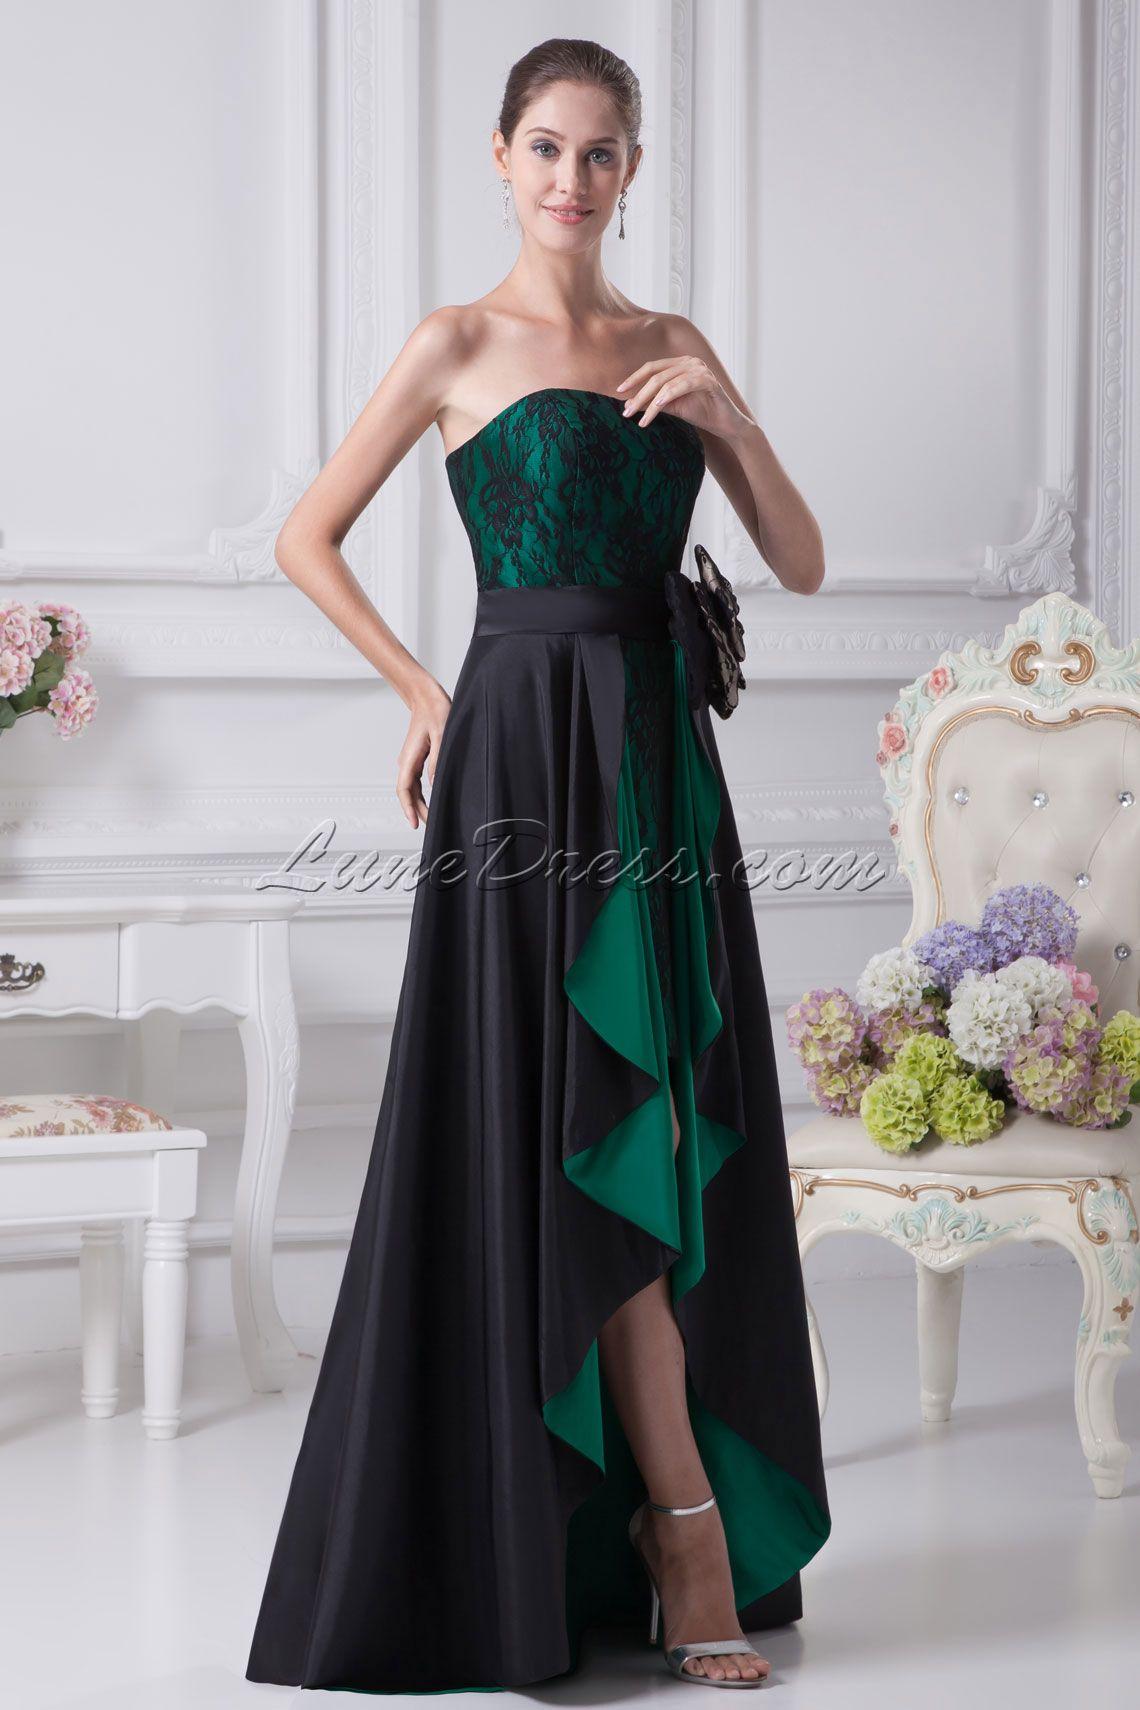 Black prom dress black prom dresses random pinterest black